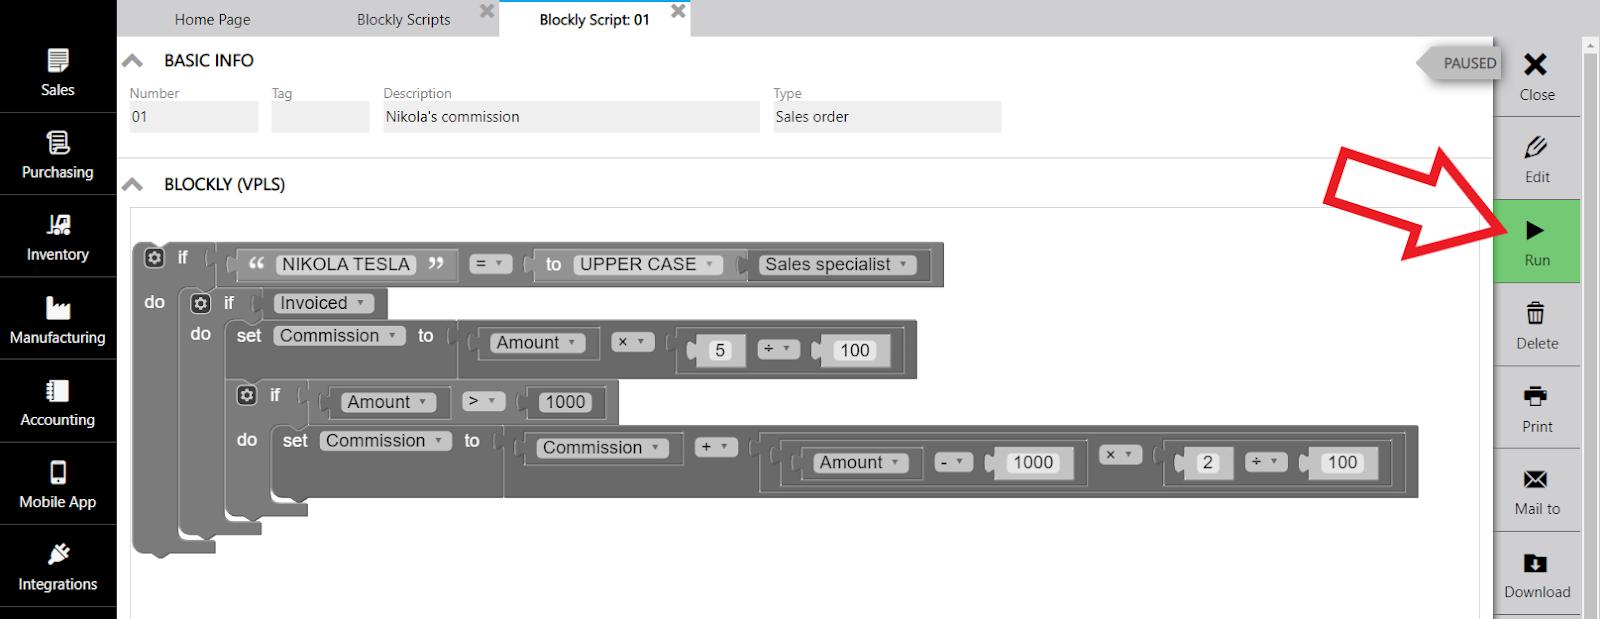 erpag blockly script